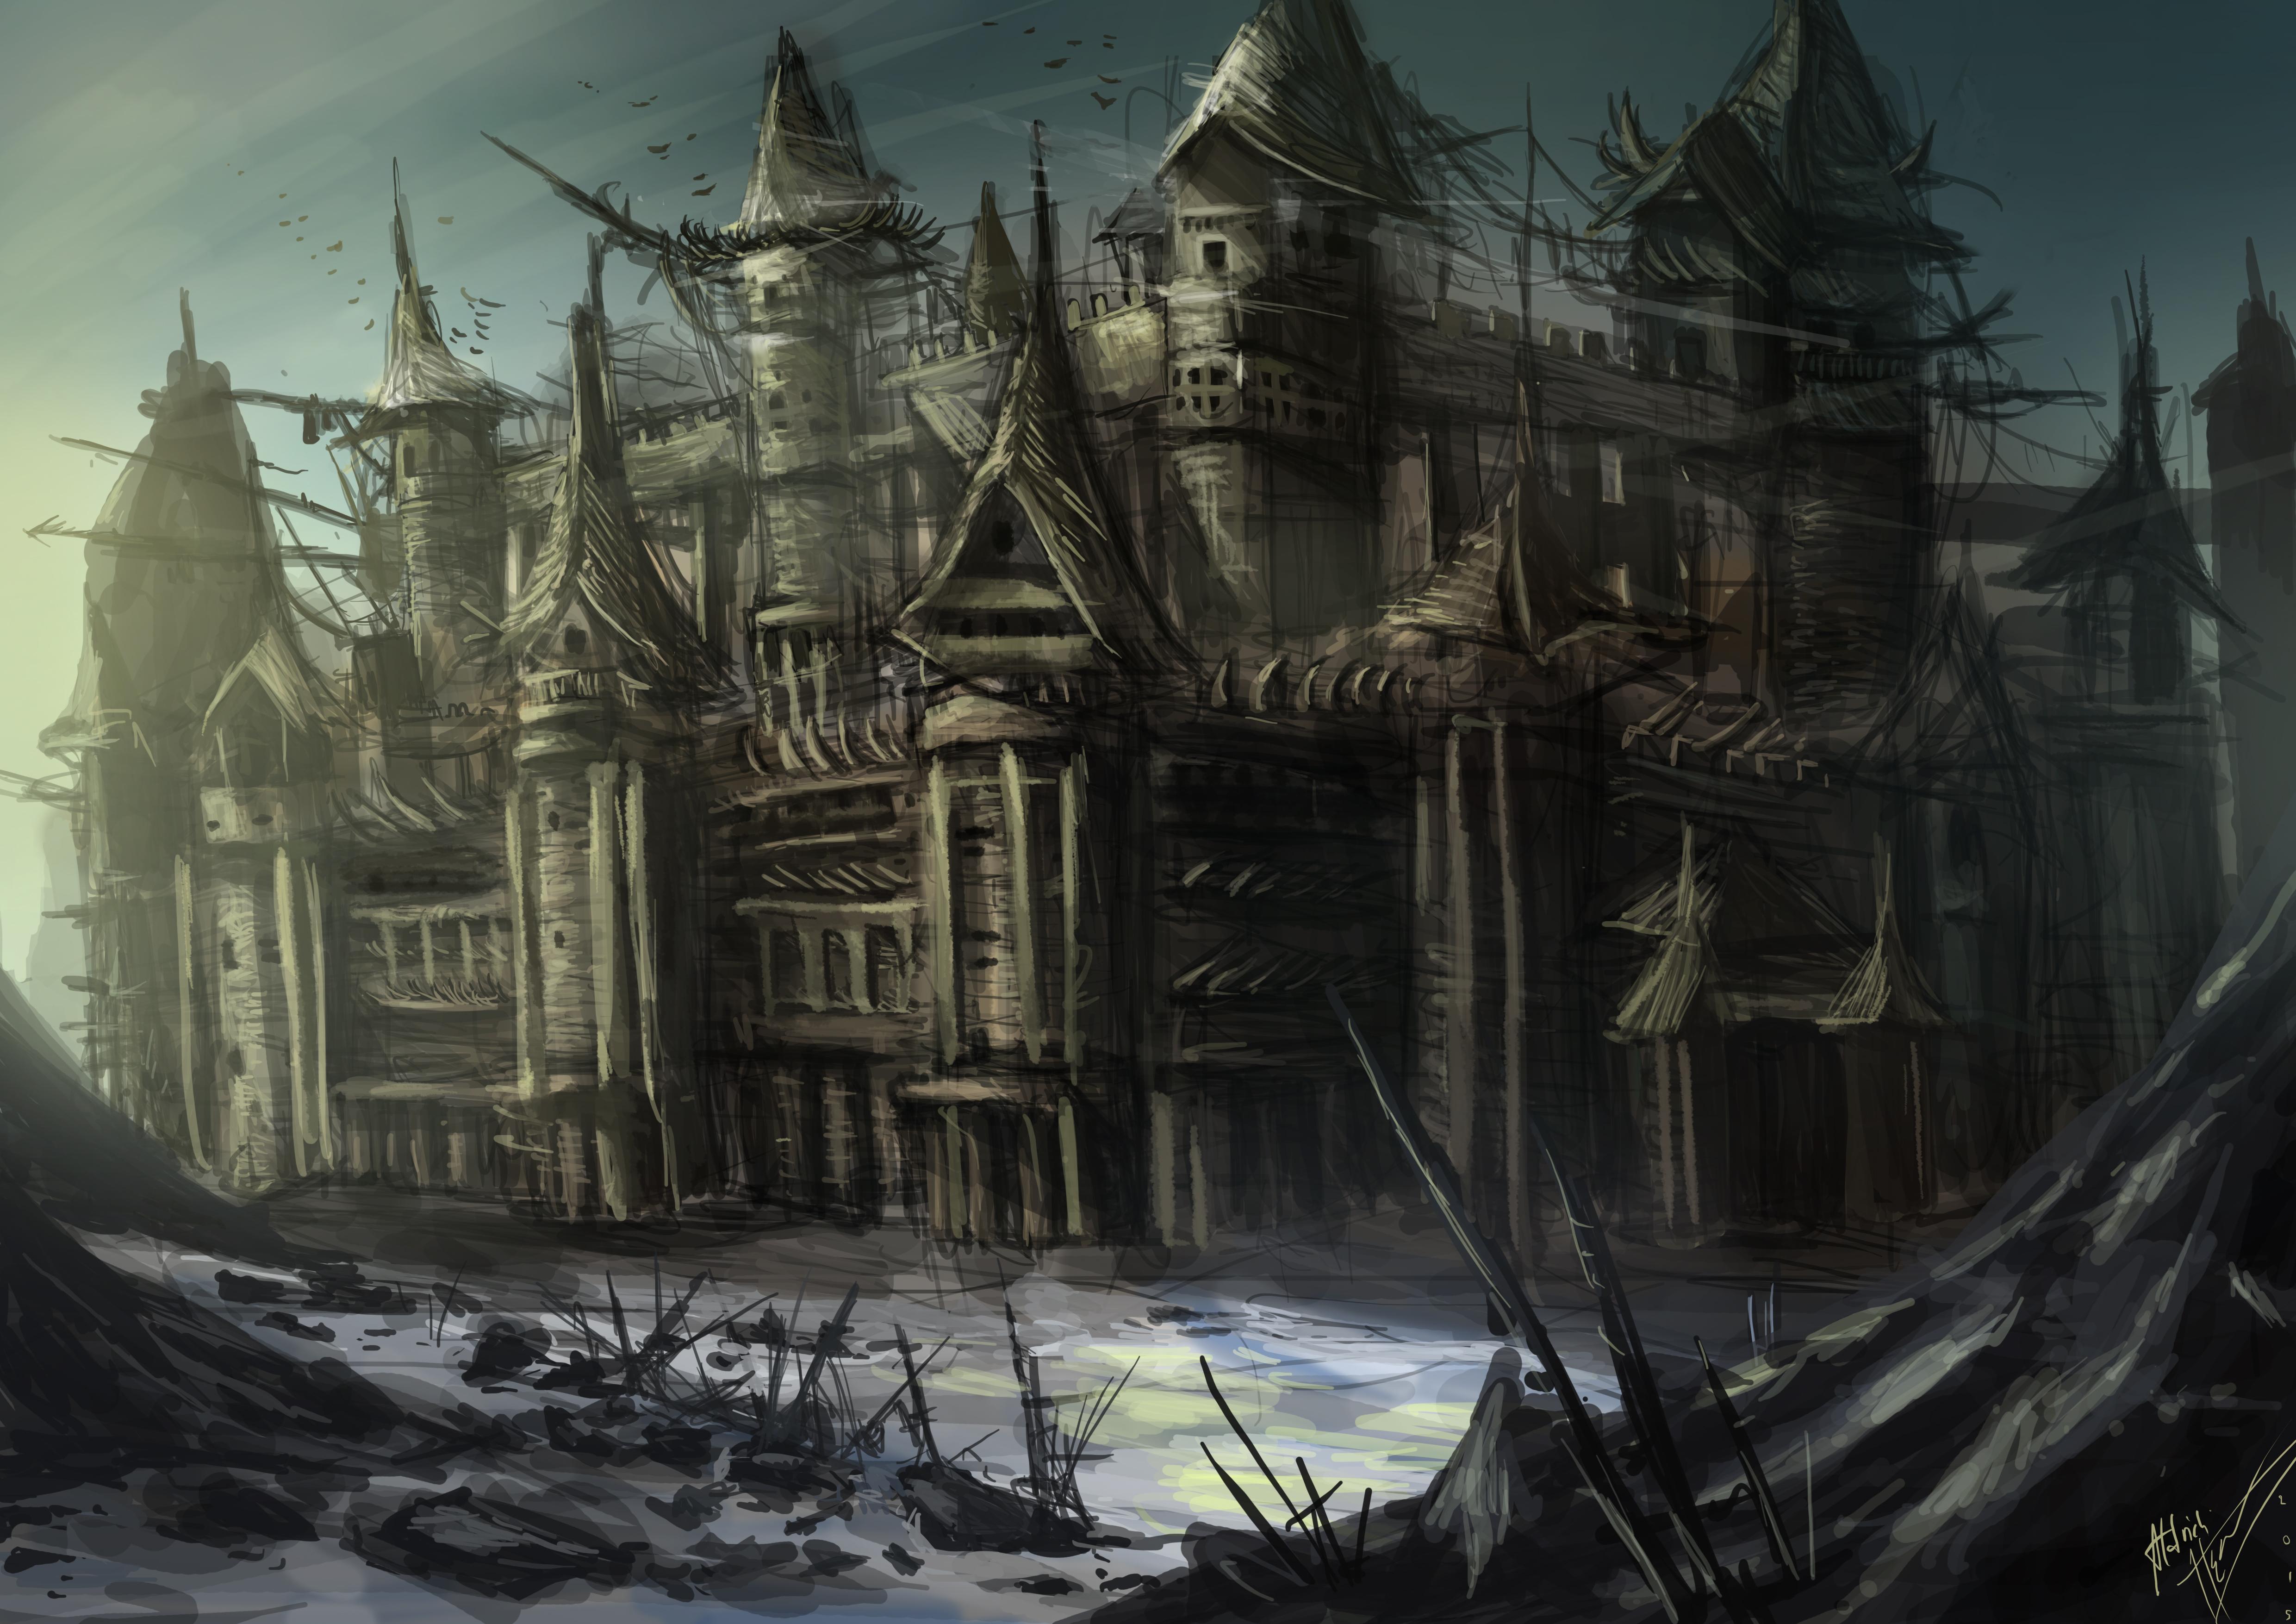 random European castle